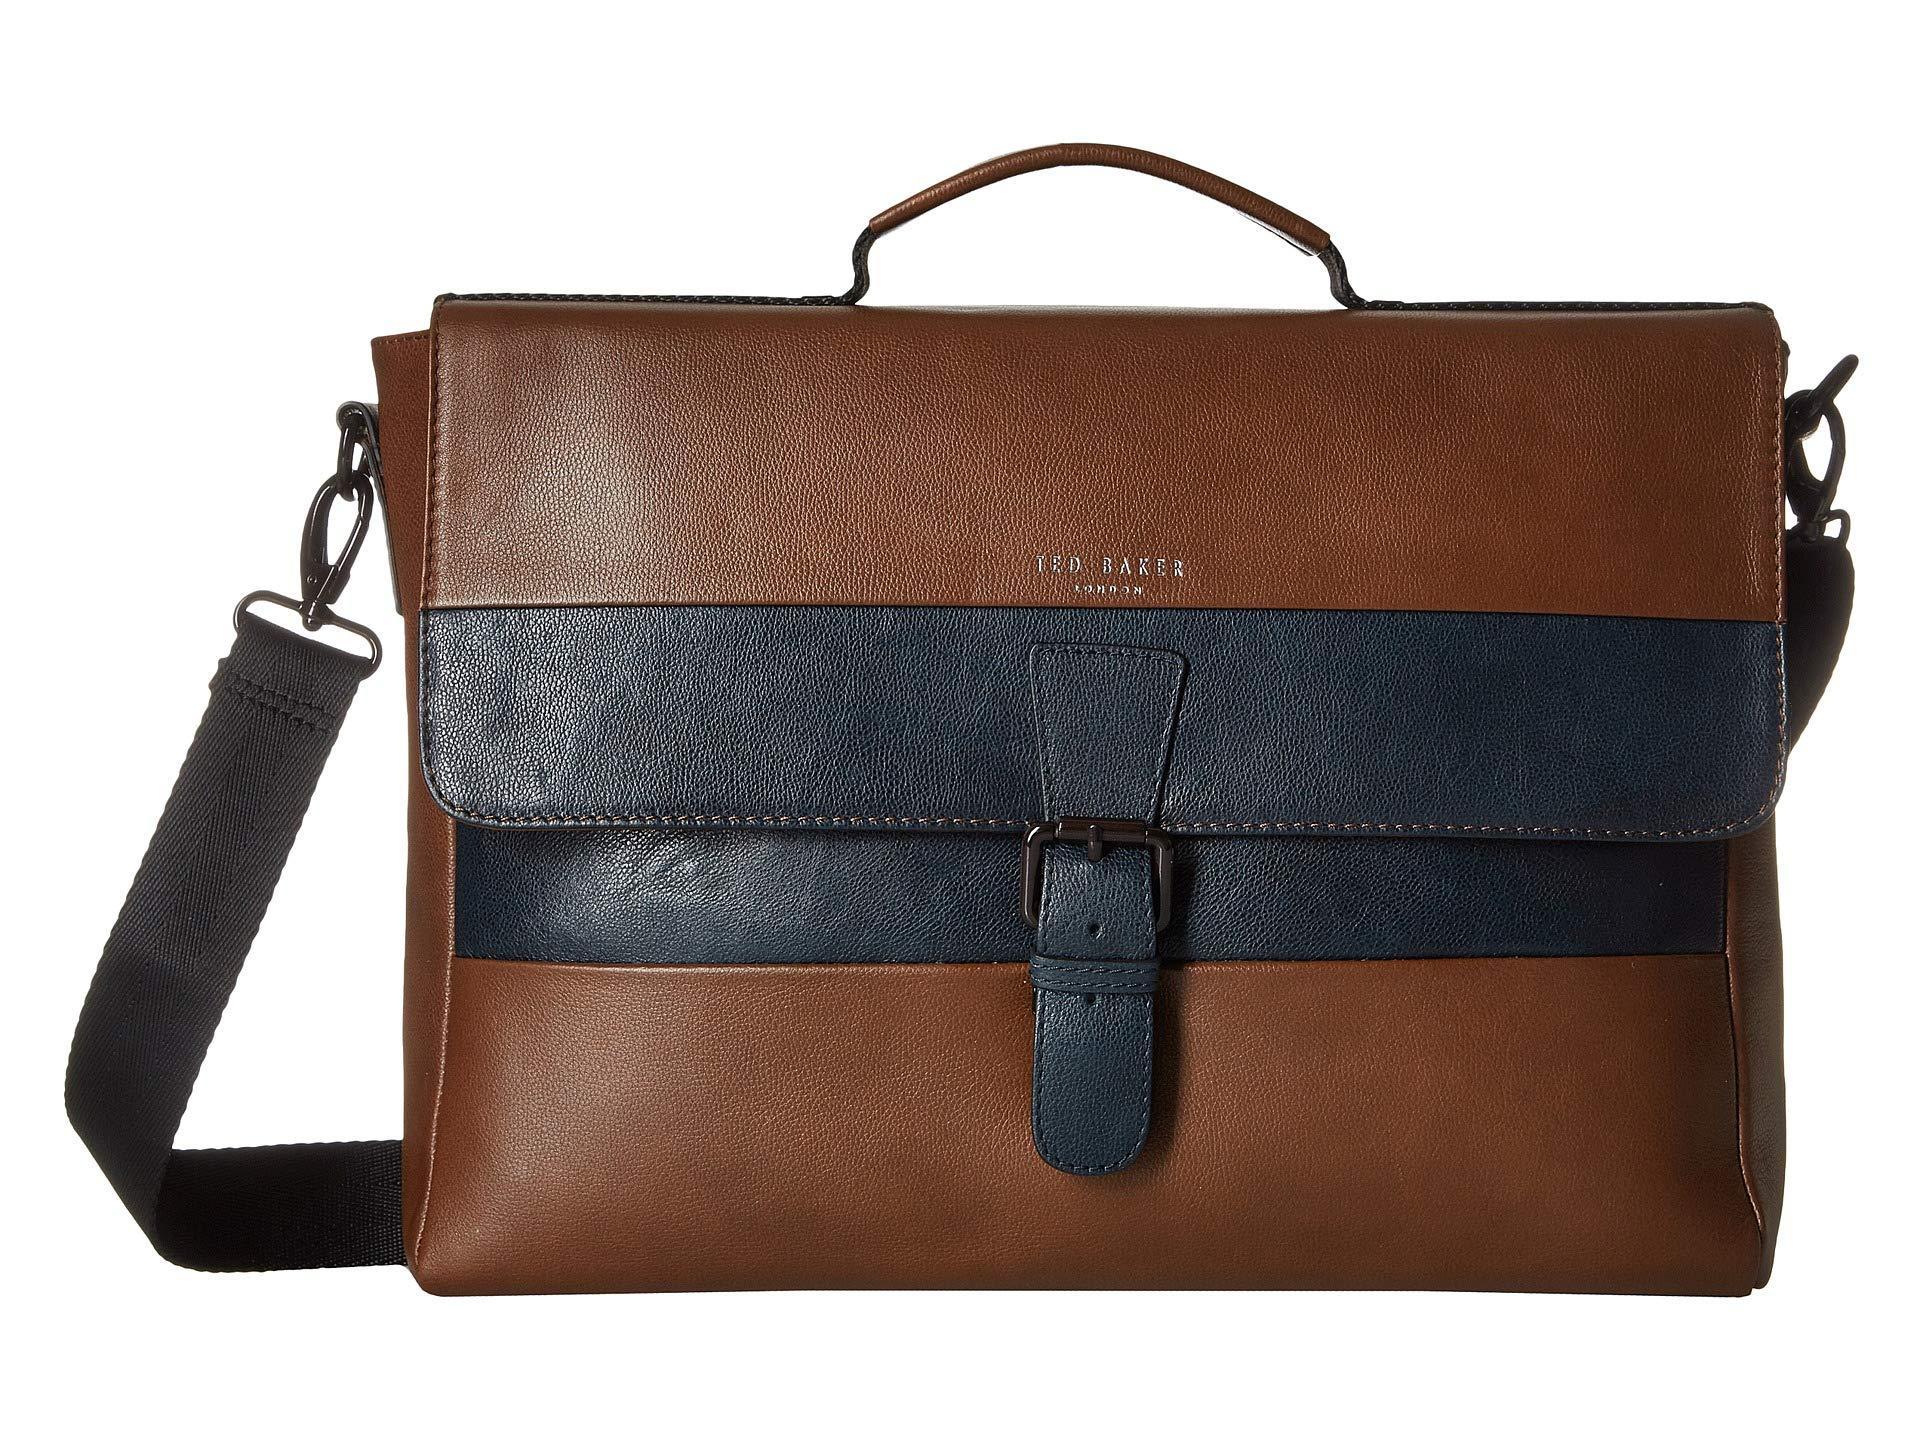 0e9cda0b8 Ted Baker. Men s Brown Bocelli Striped Leather Messenger Bag ...